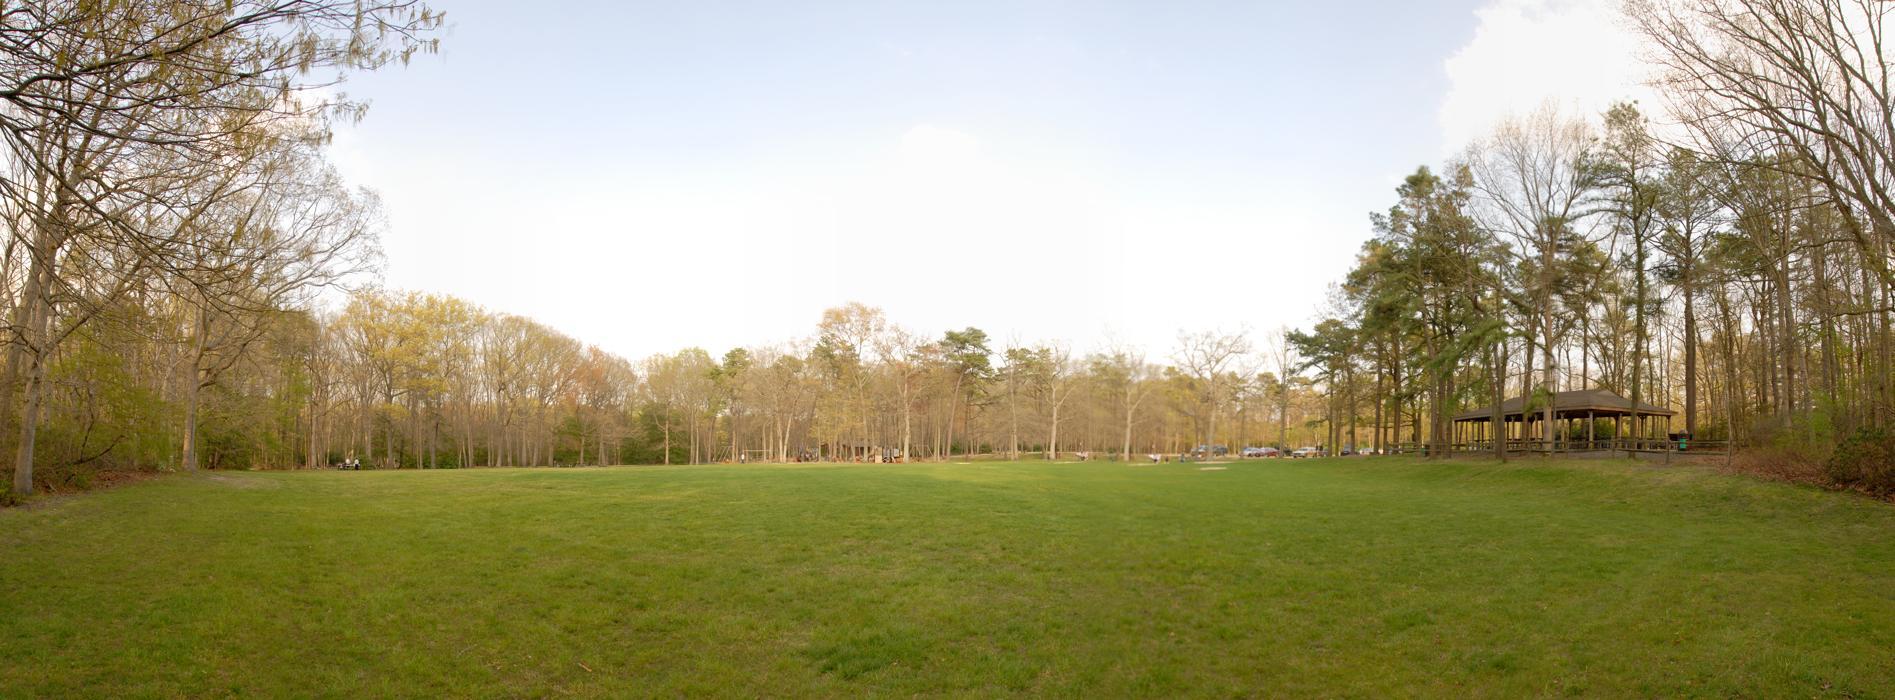 field, panoramic, trees